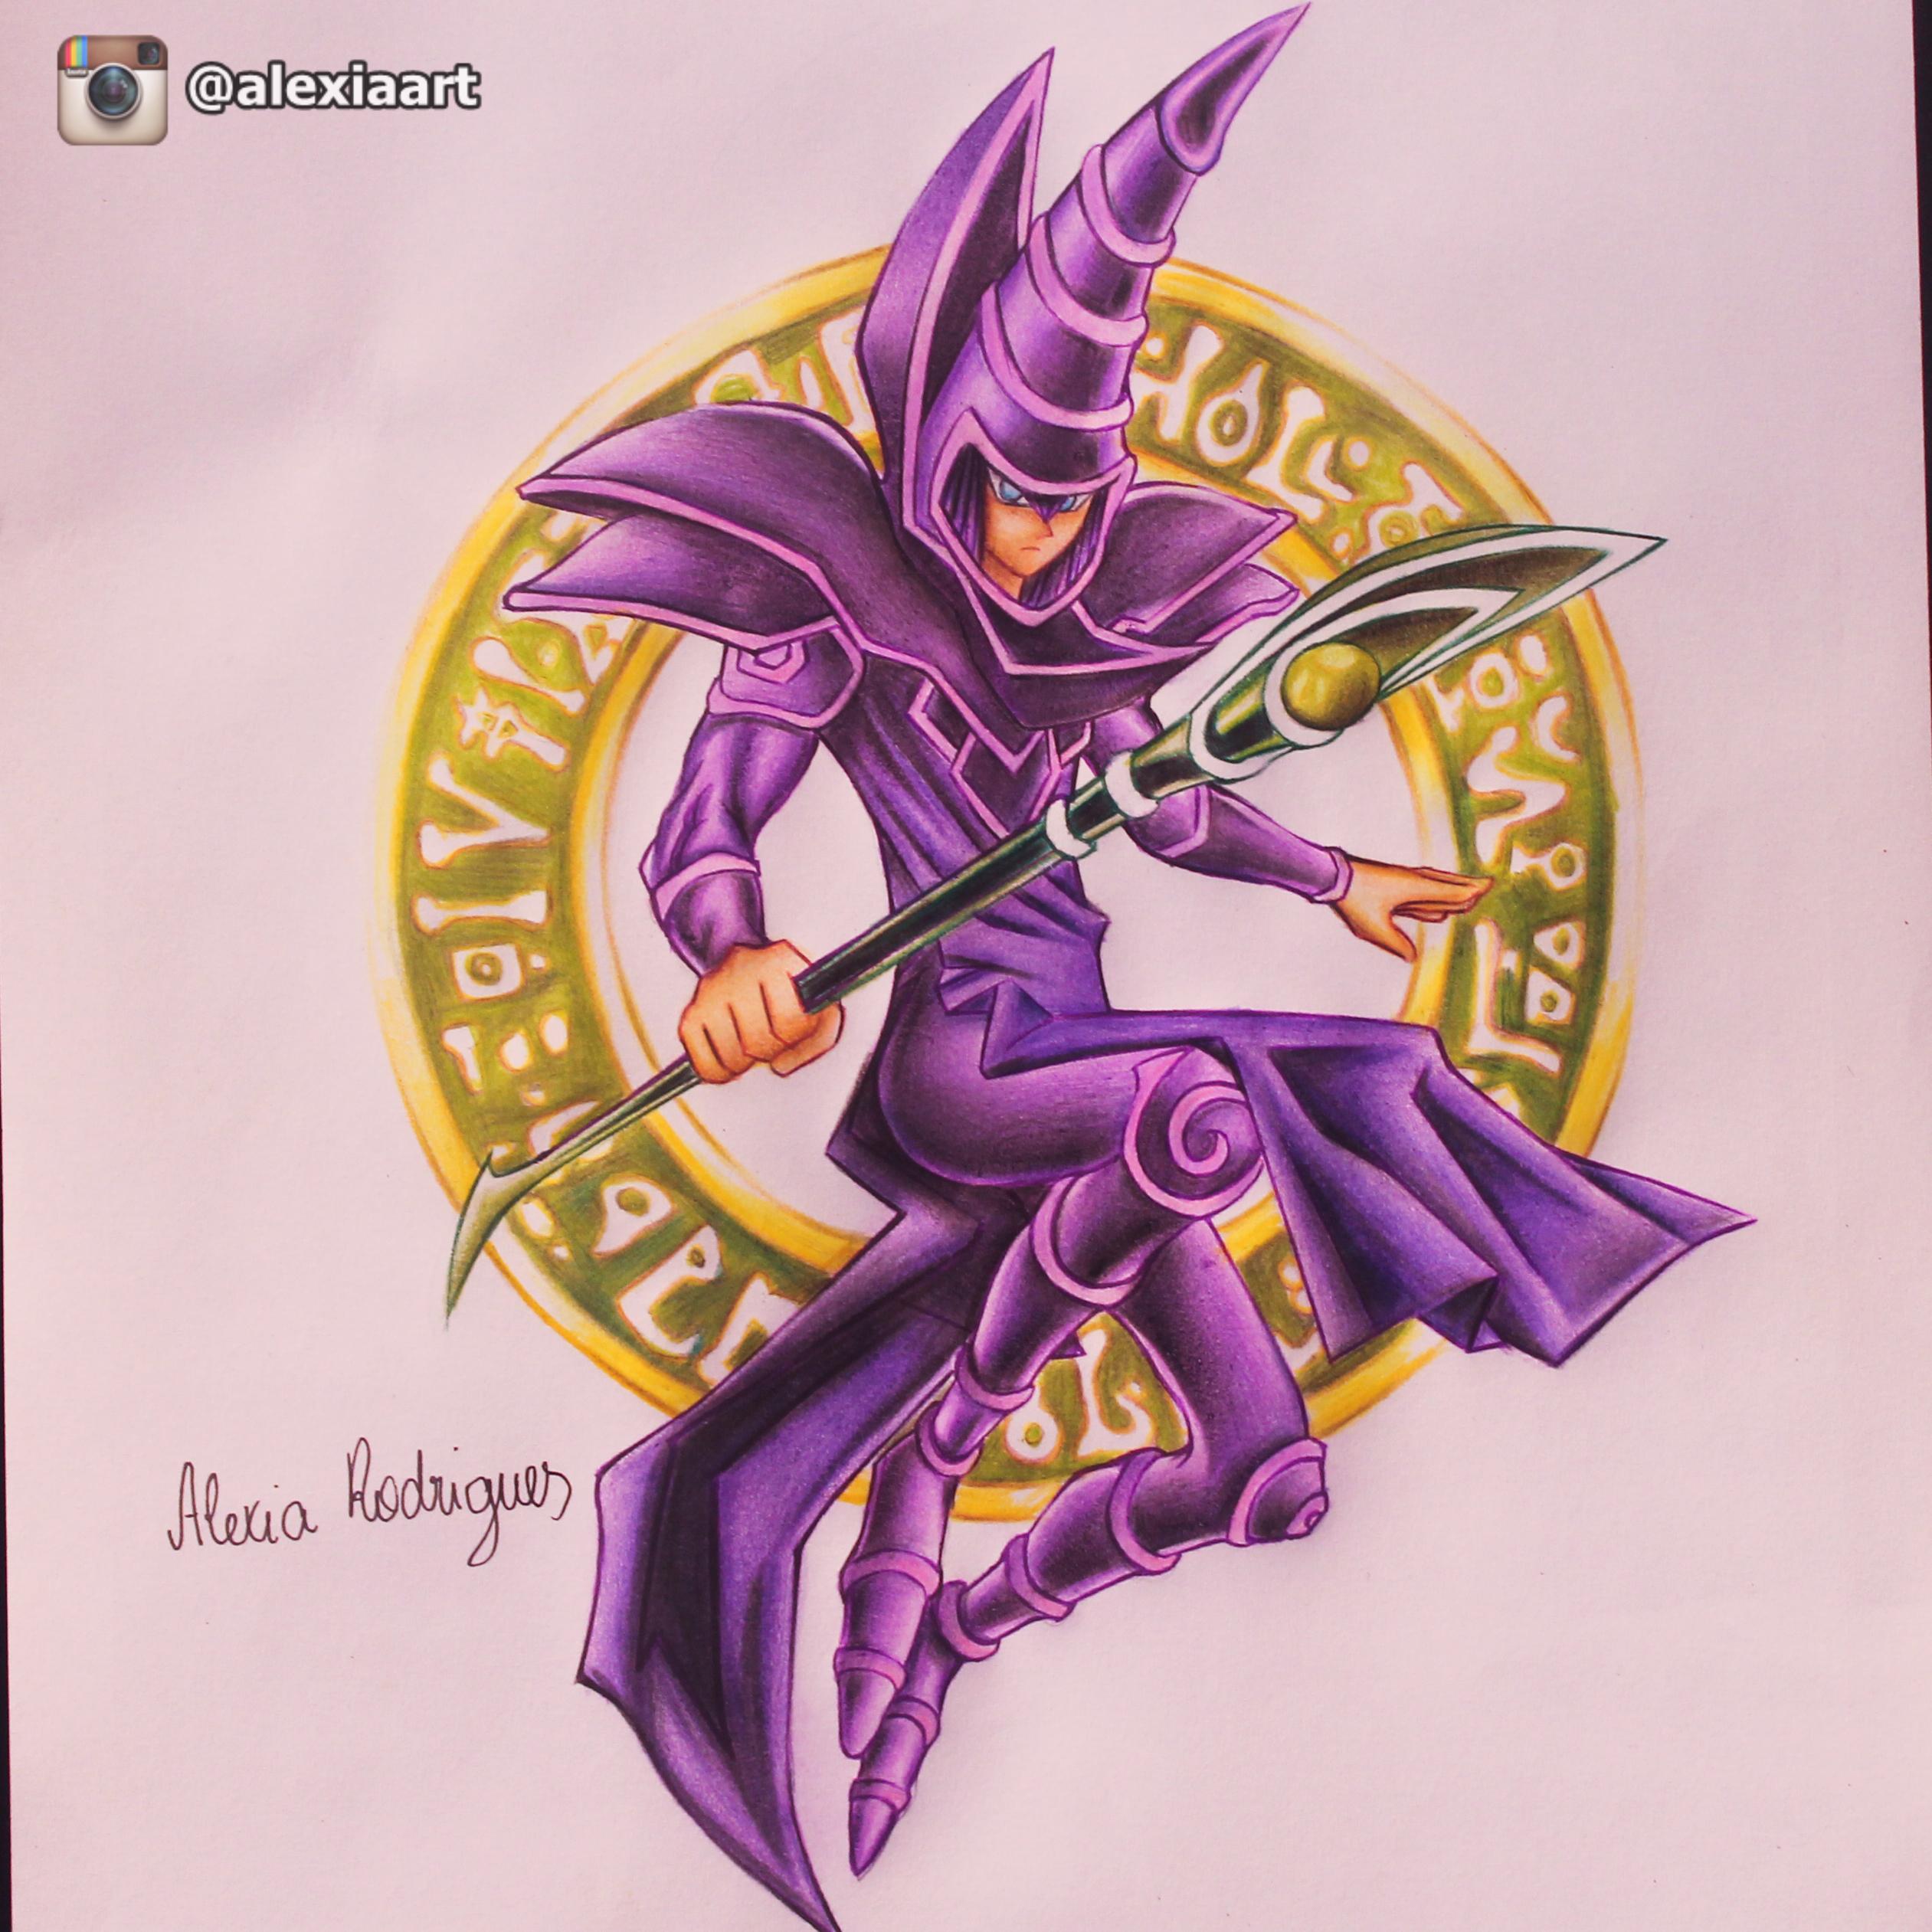 dark magician yugioh by alexiarodrigues on deviantart